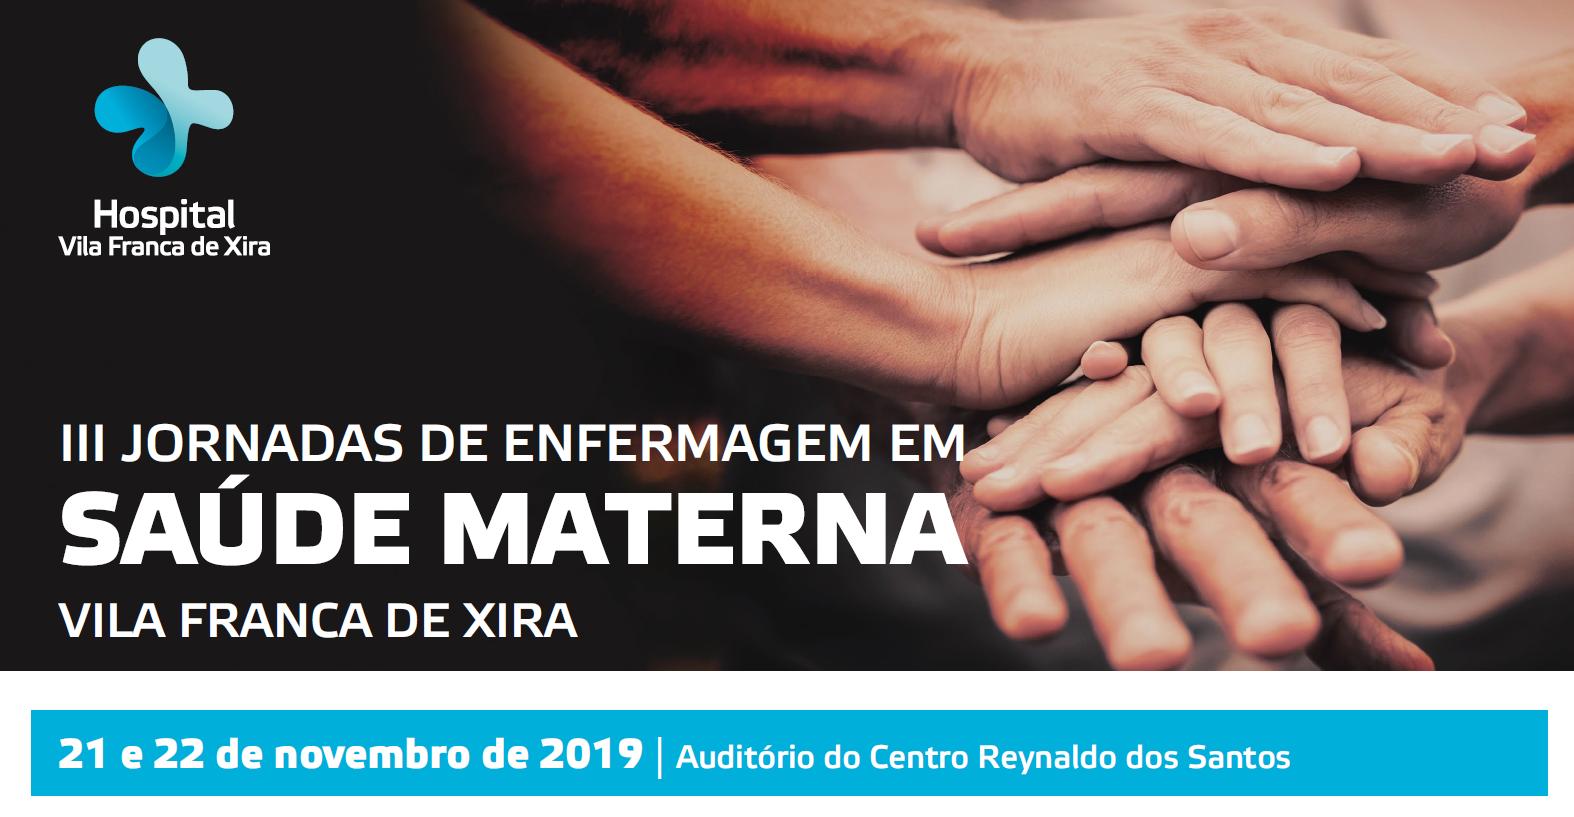 hospital-de-vila-franca-de-xira-III Jornadas de Enfermagem em Saúde Materna